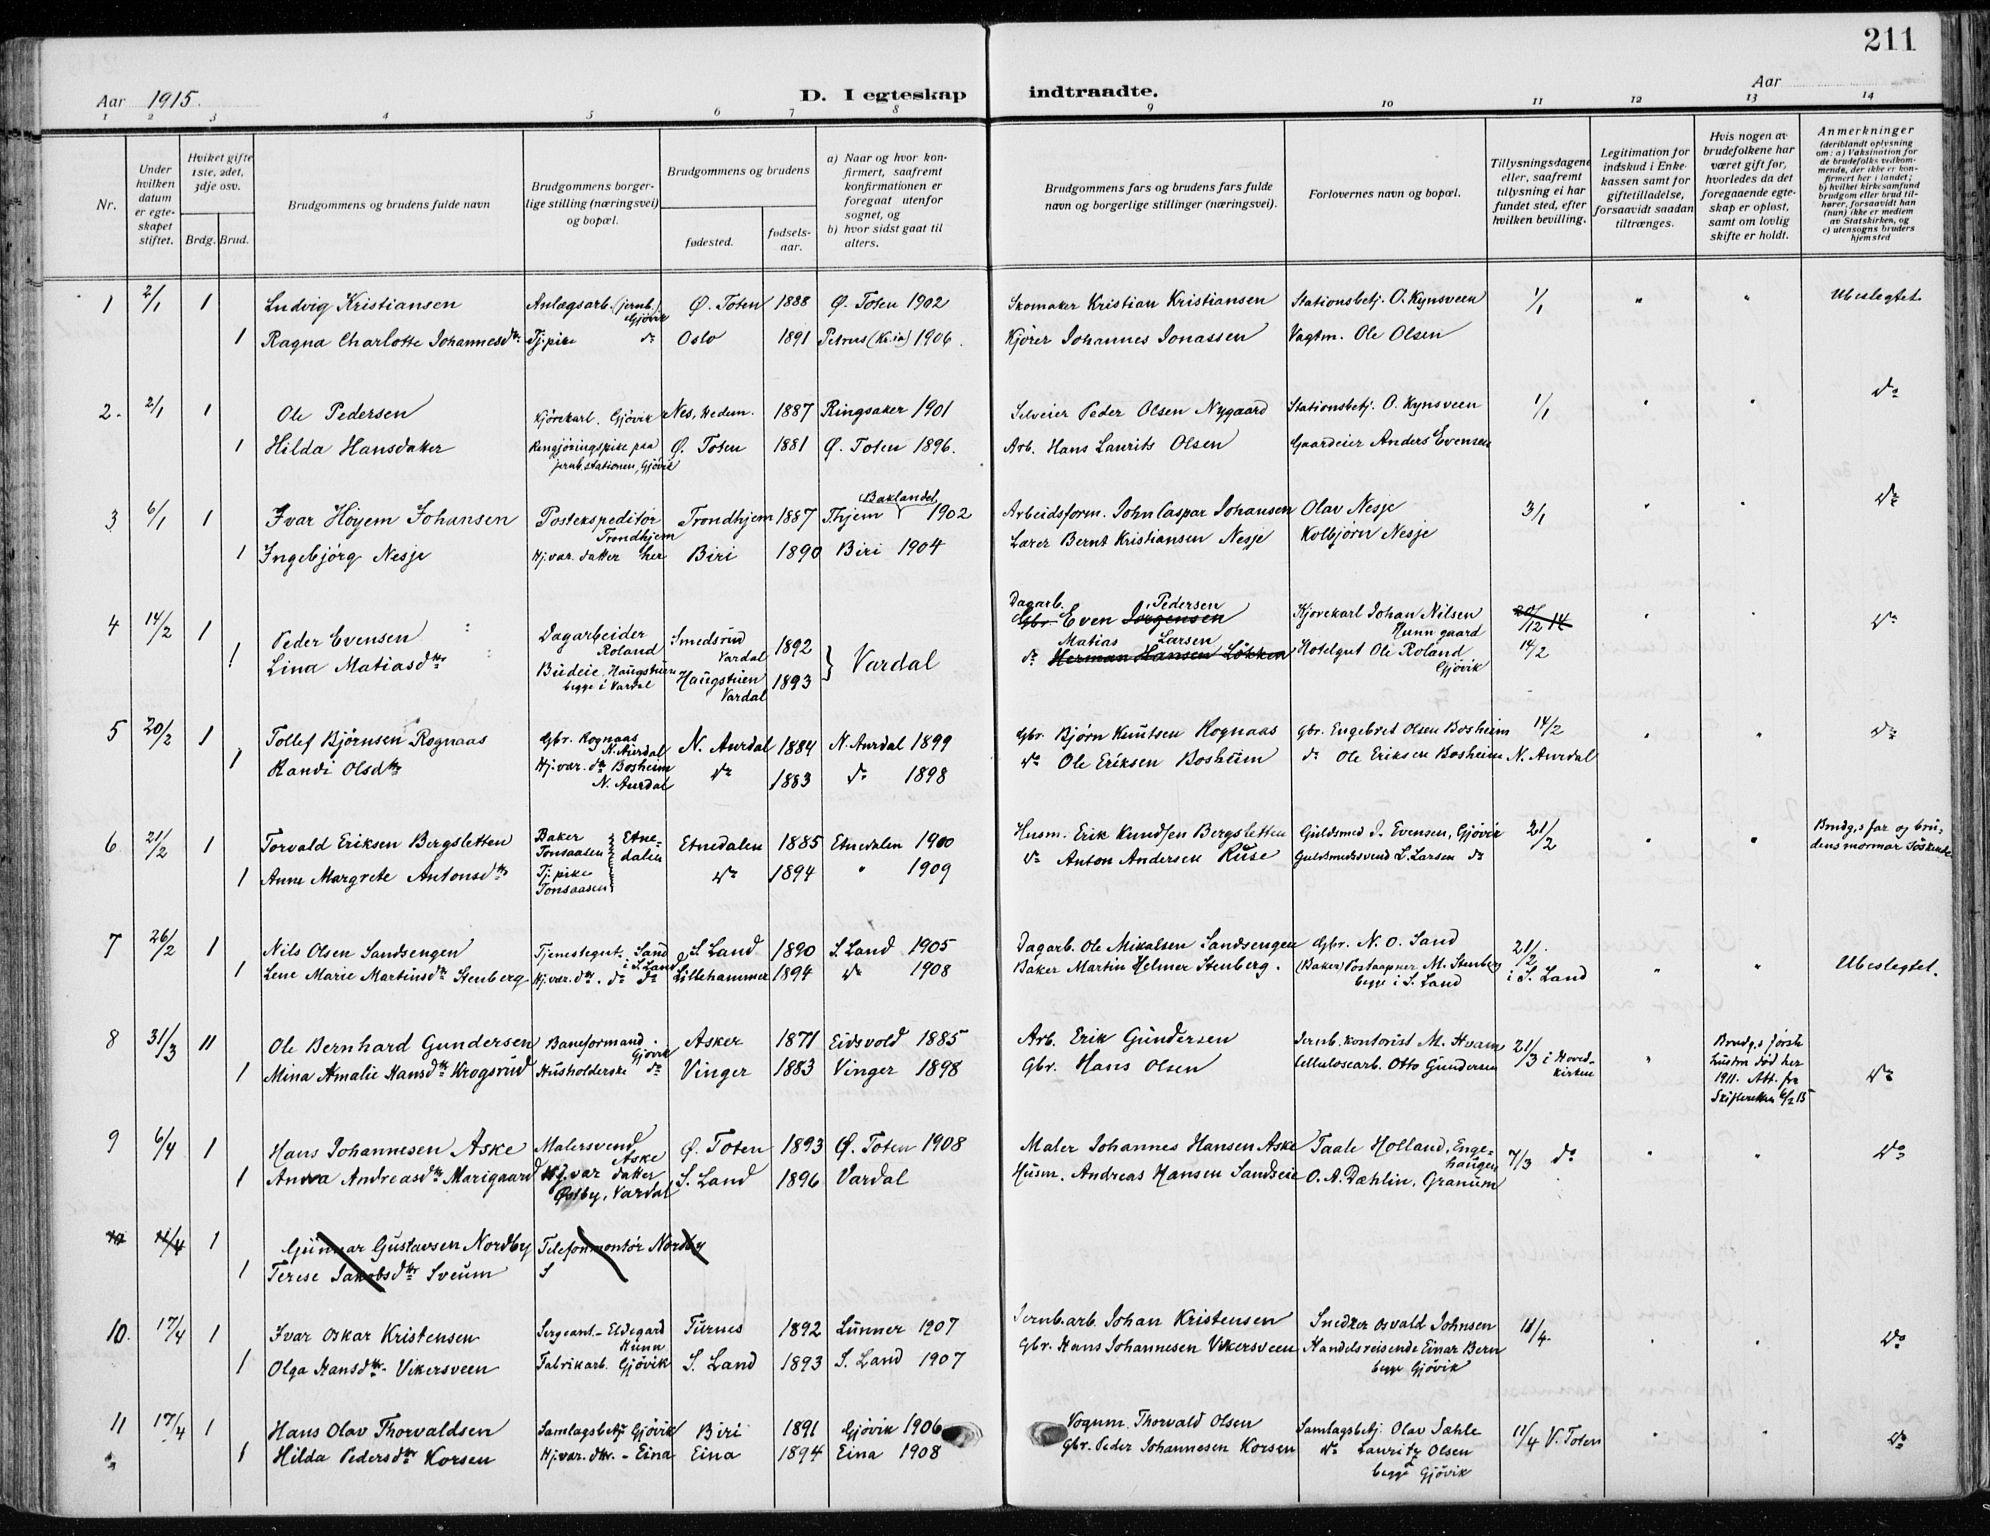 SAH, Vardal prestekontor, H/Ha/Haa/L0014: Ministerialbok nr. 14, 1912-1922, s. 211